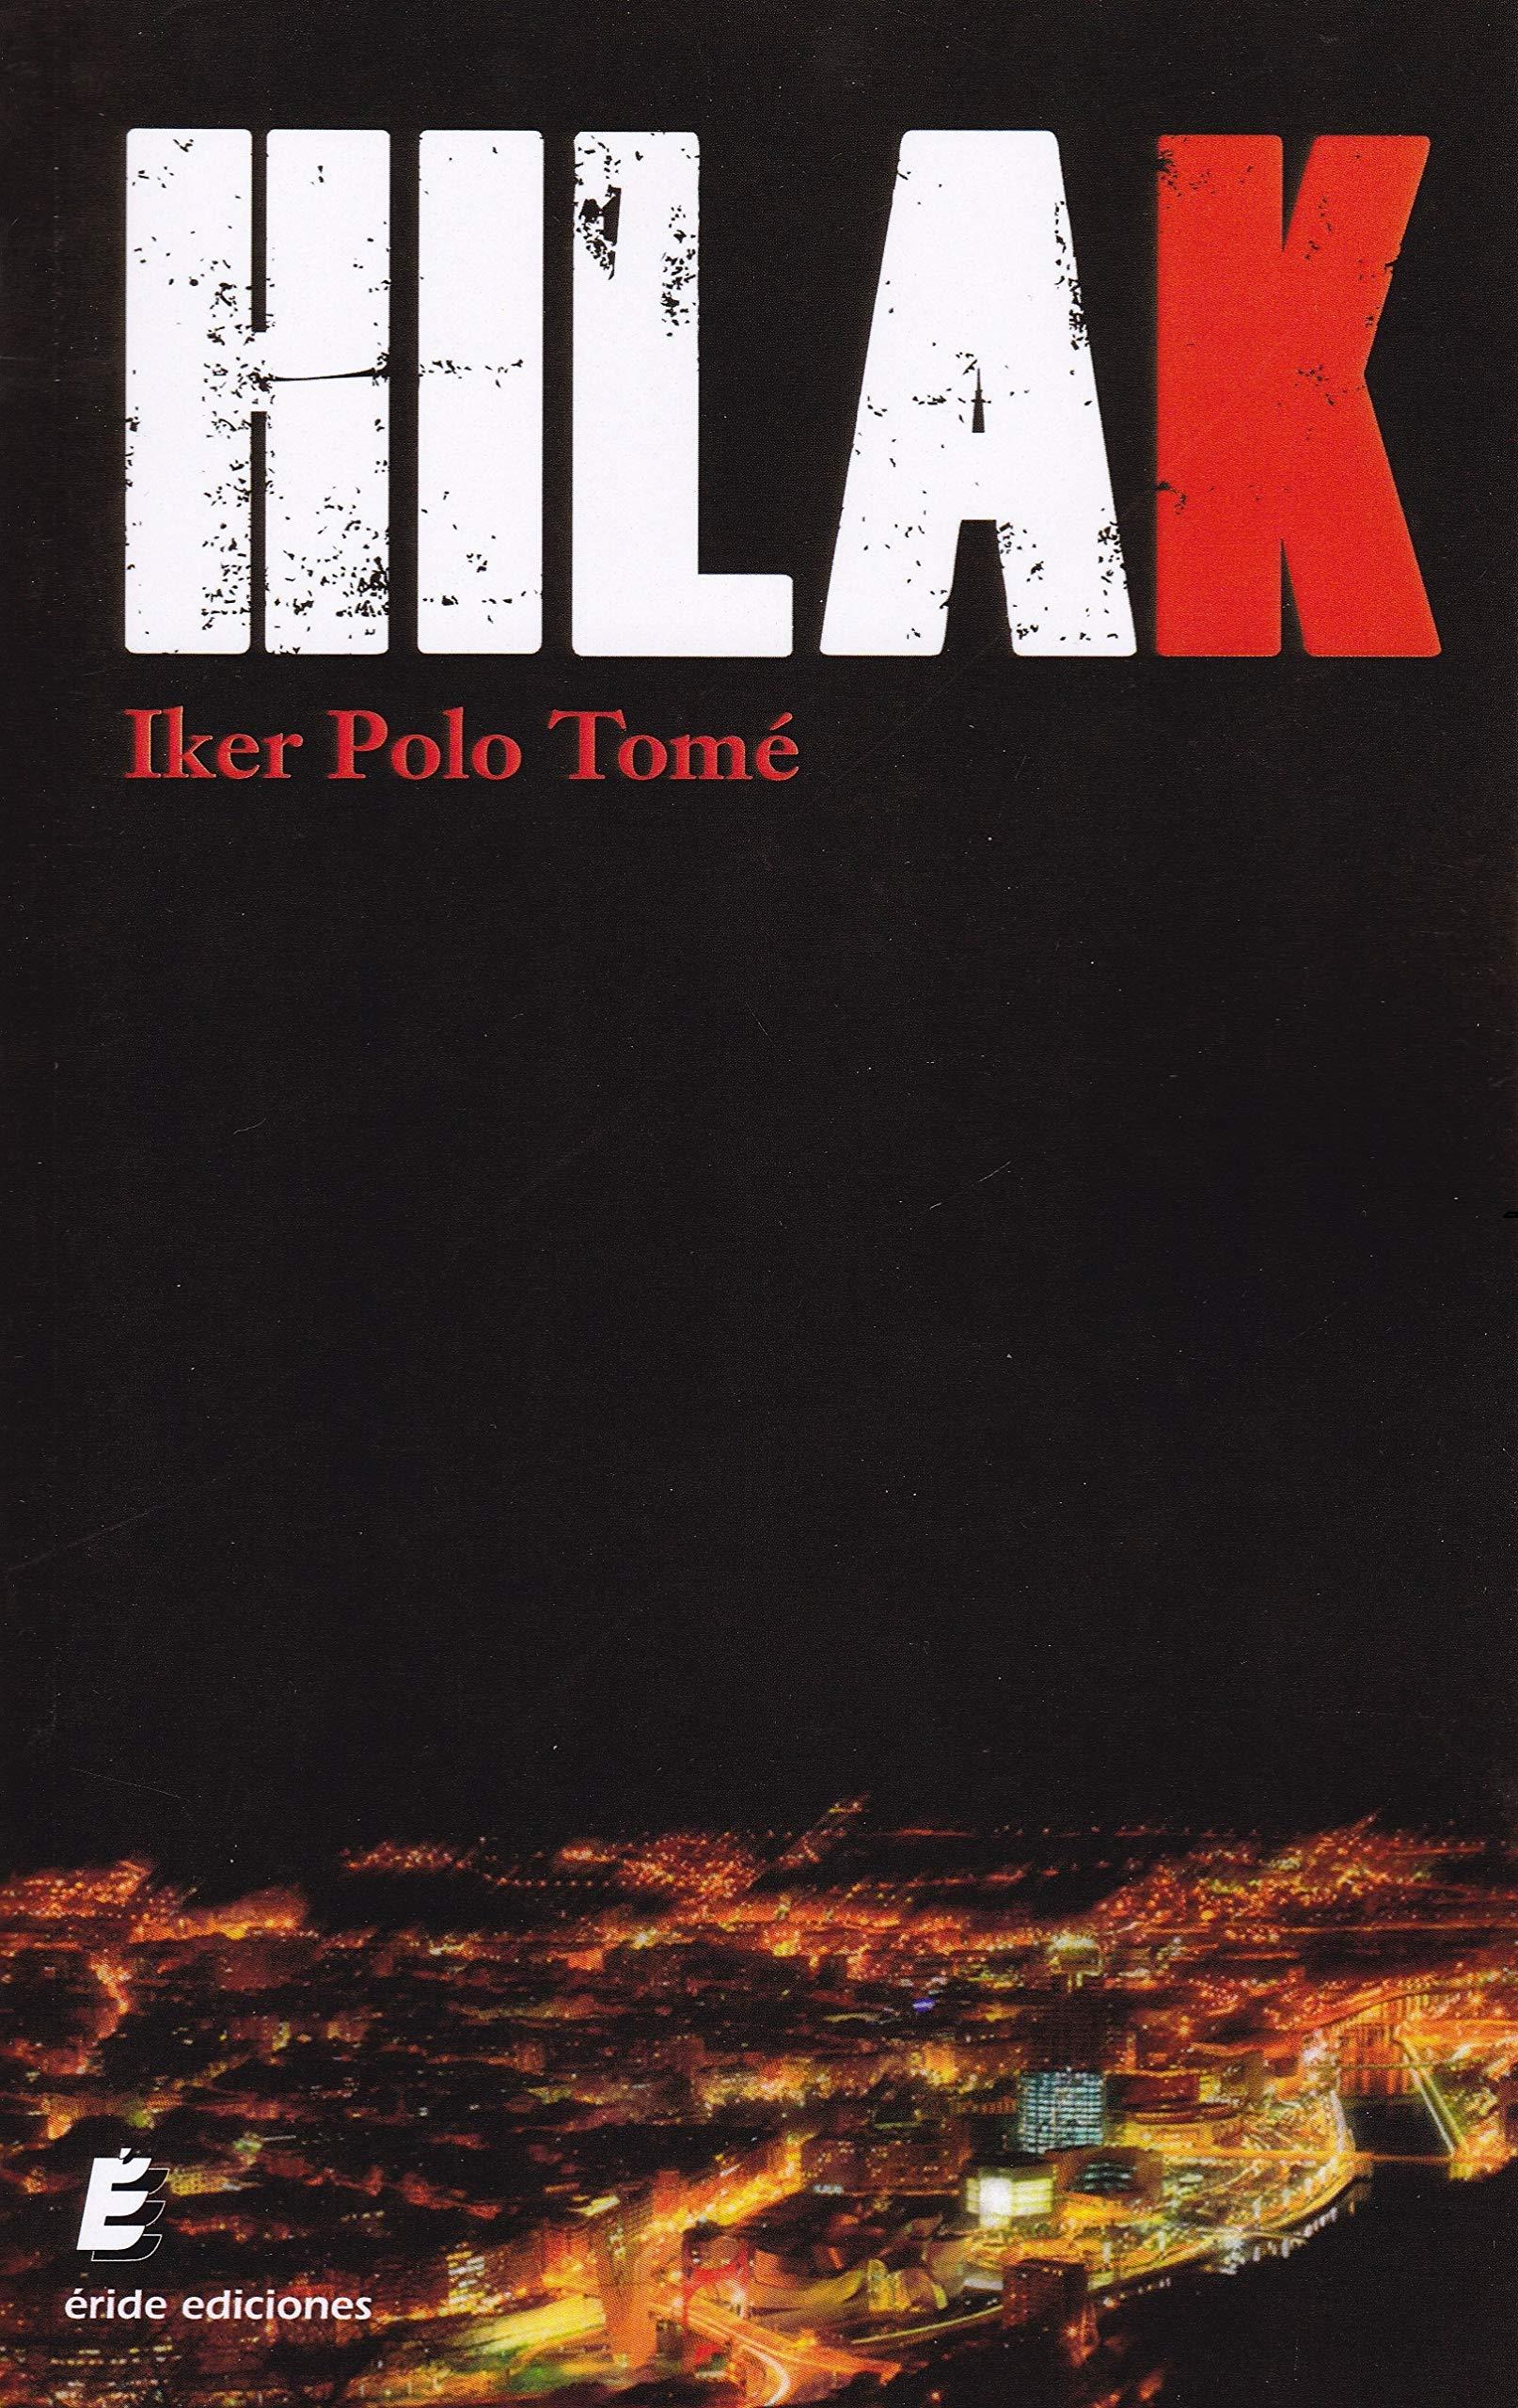 Hilak: Amazon.es: Iker Polo Tomé: Libros